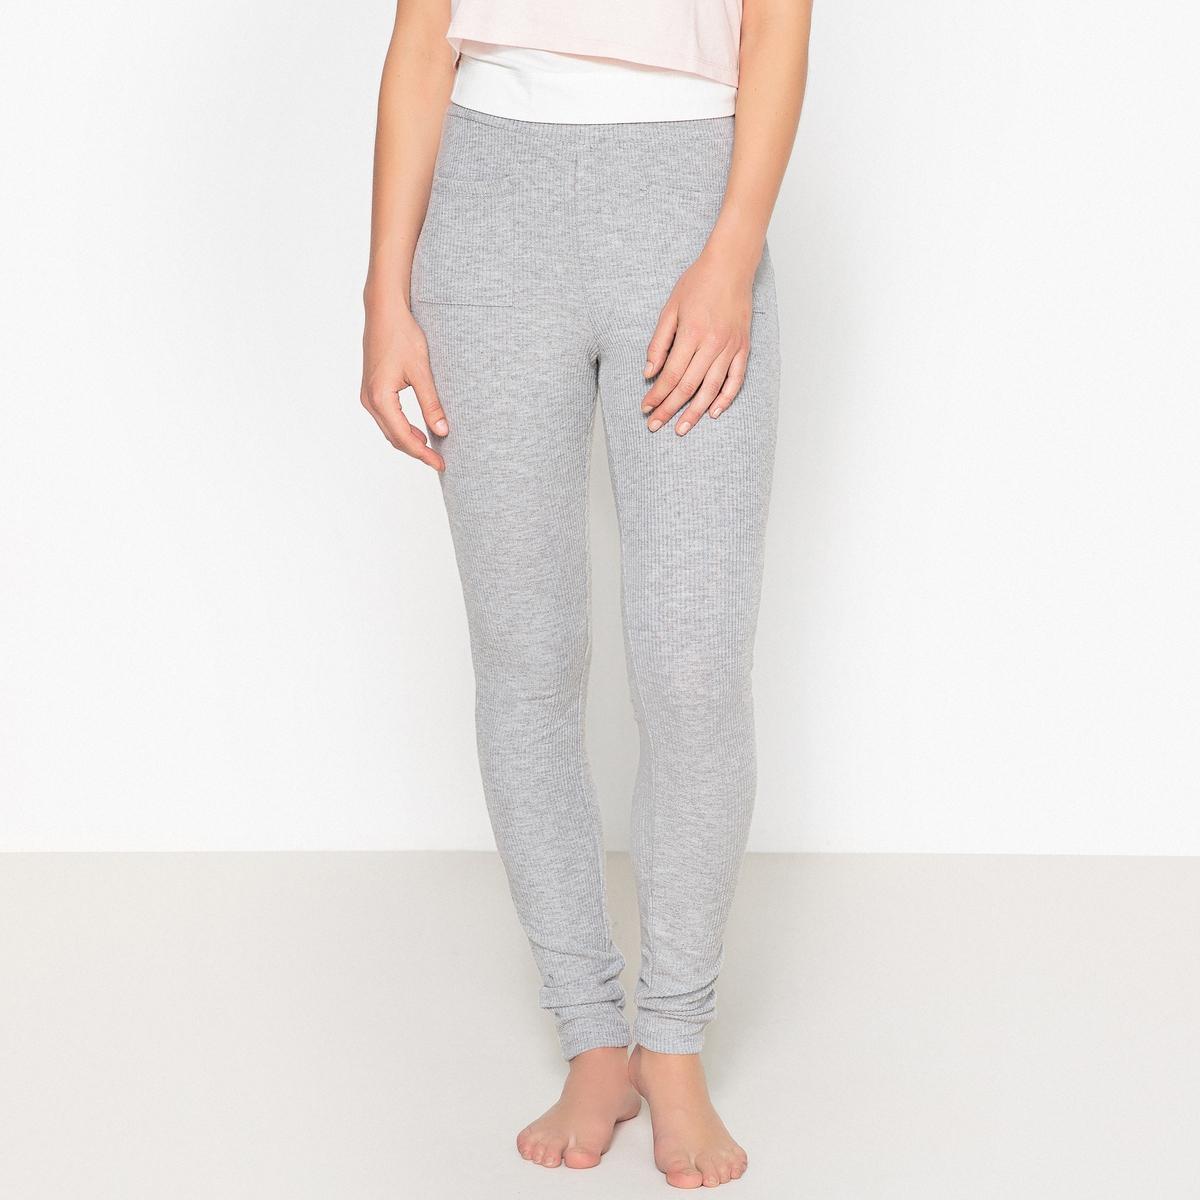 Pantaloni da pigiama, extra morbidi